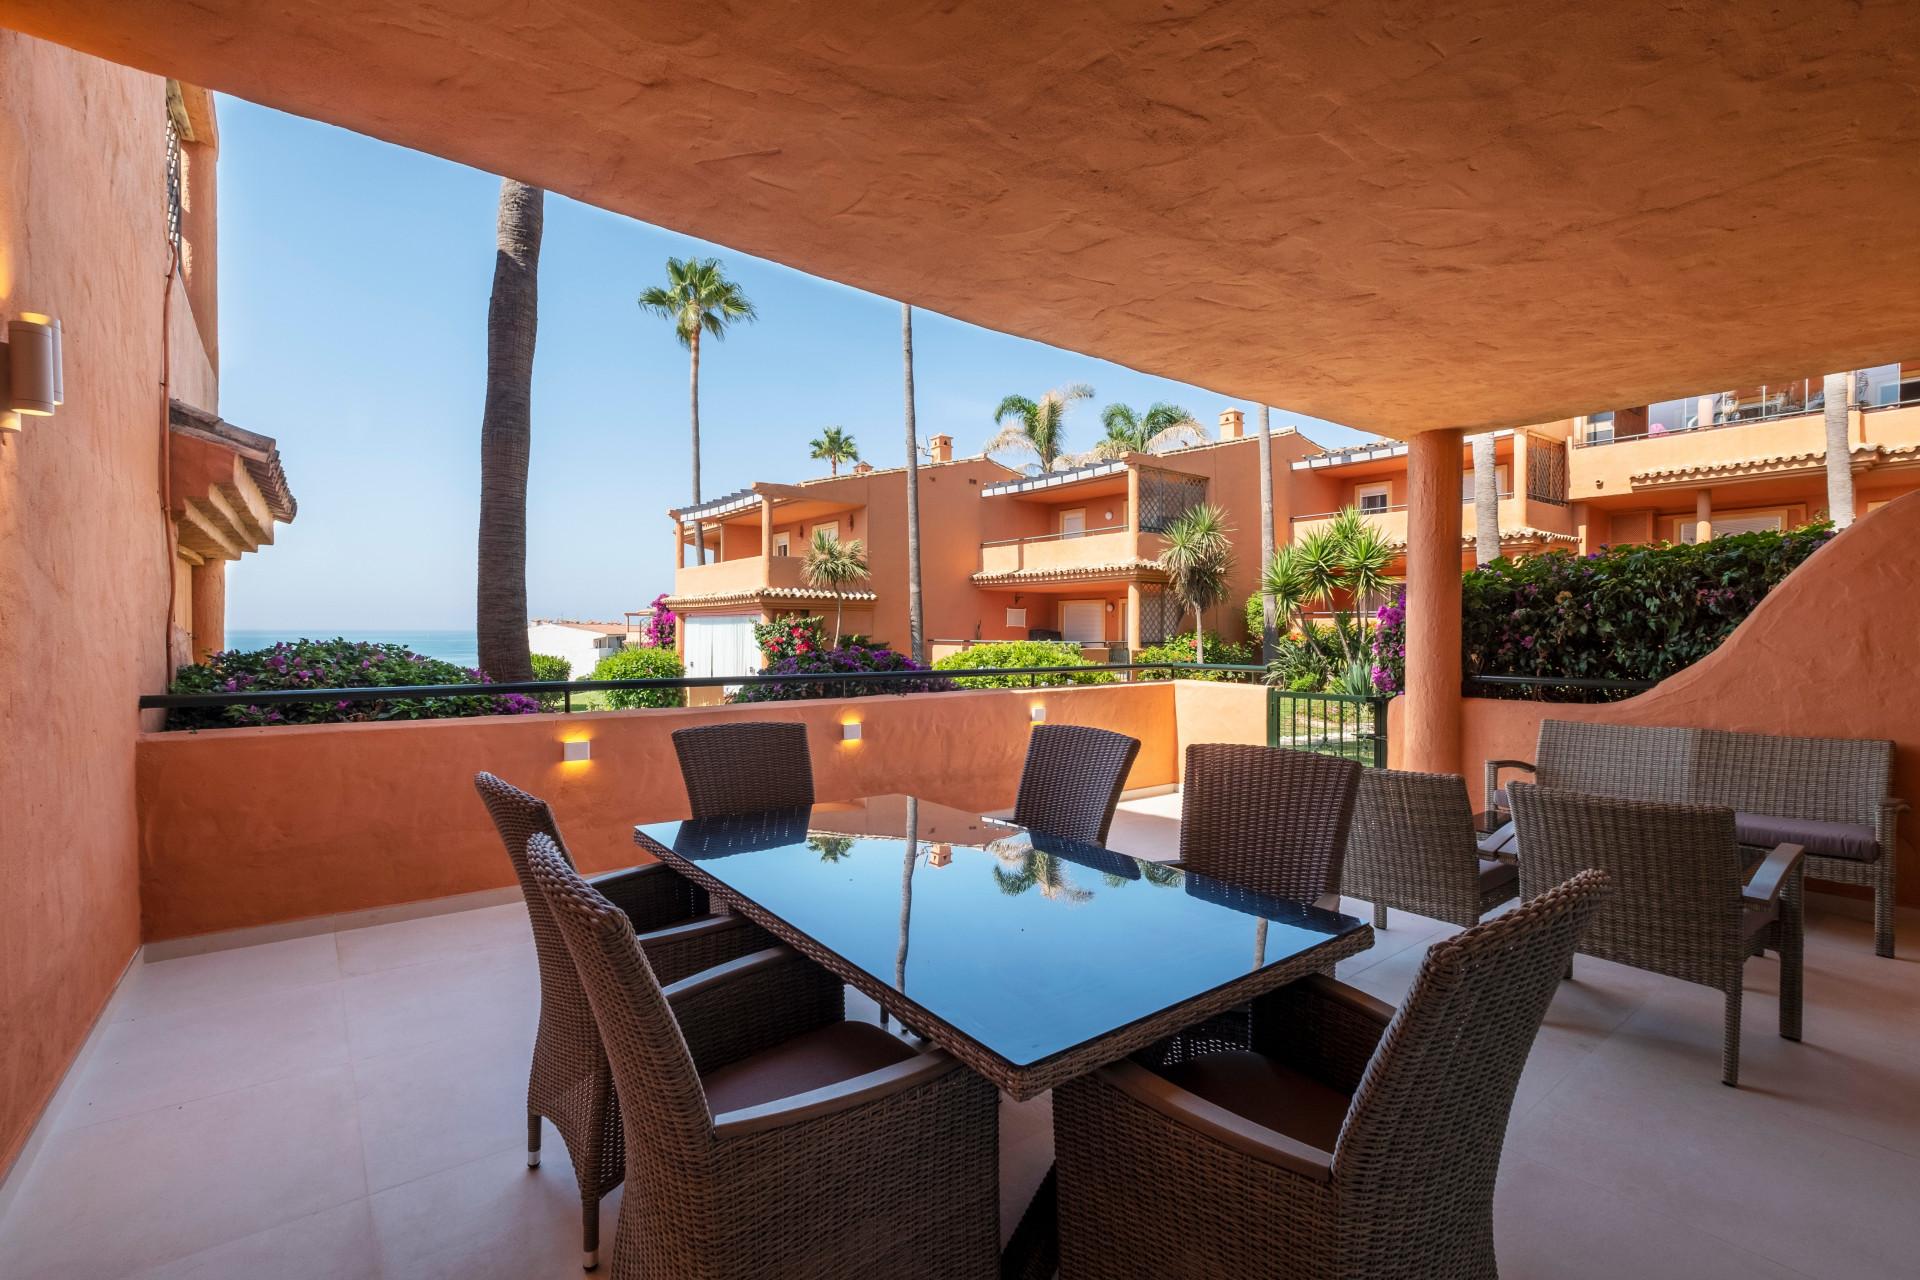 property for sale in bermuda beach